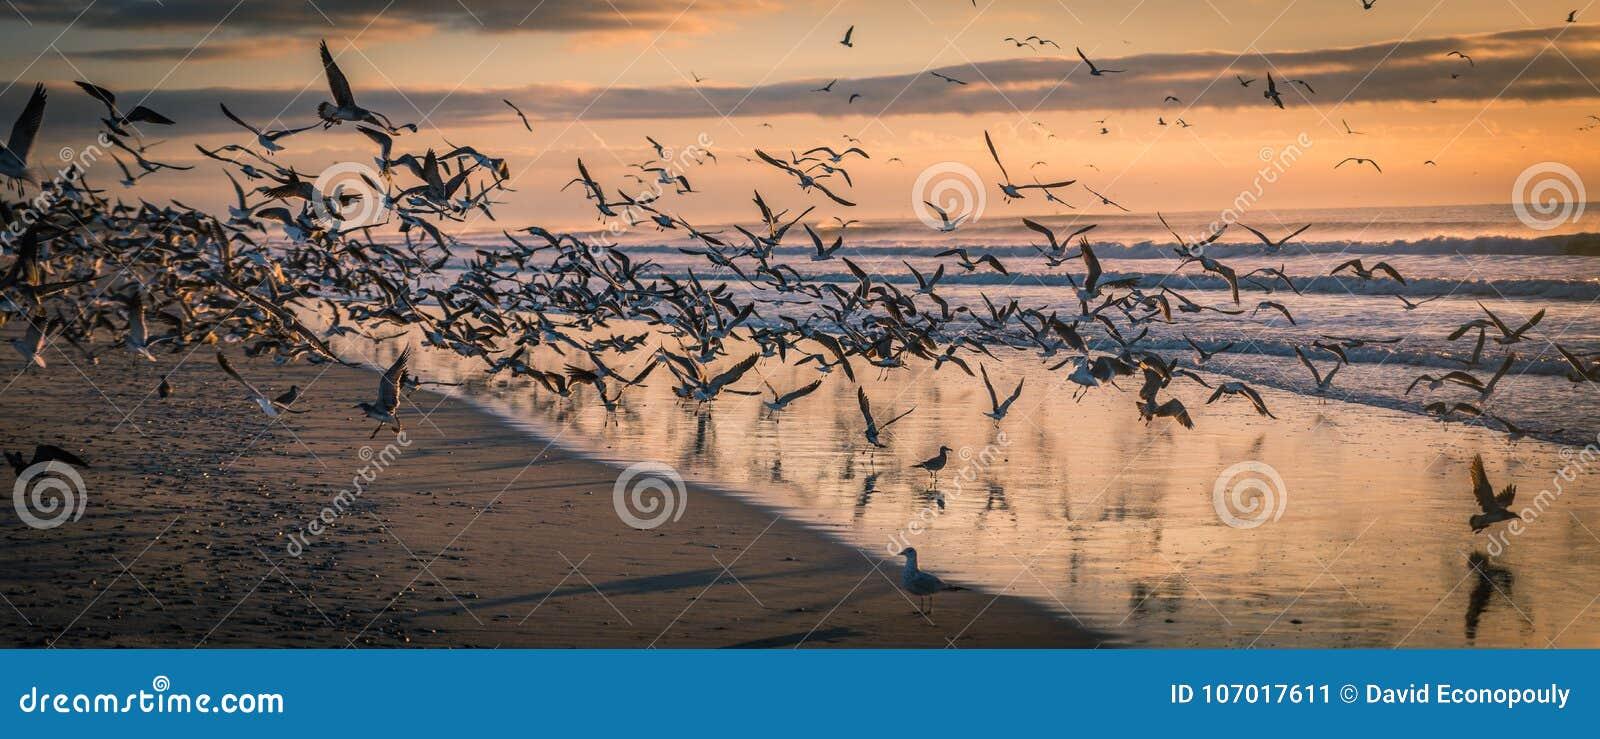 Flock av Seagulls på stranden på solnedgången